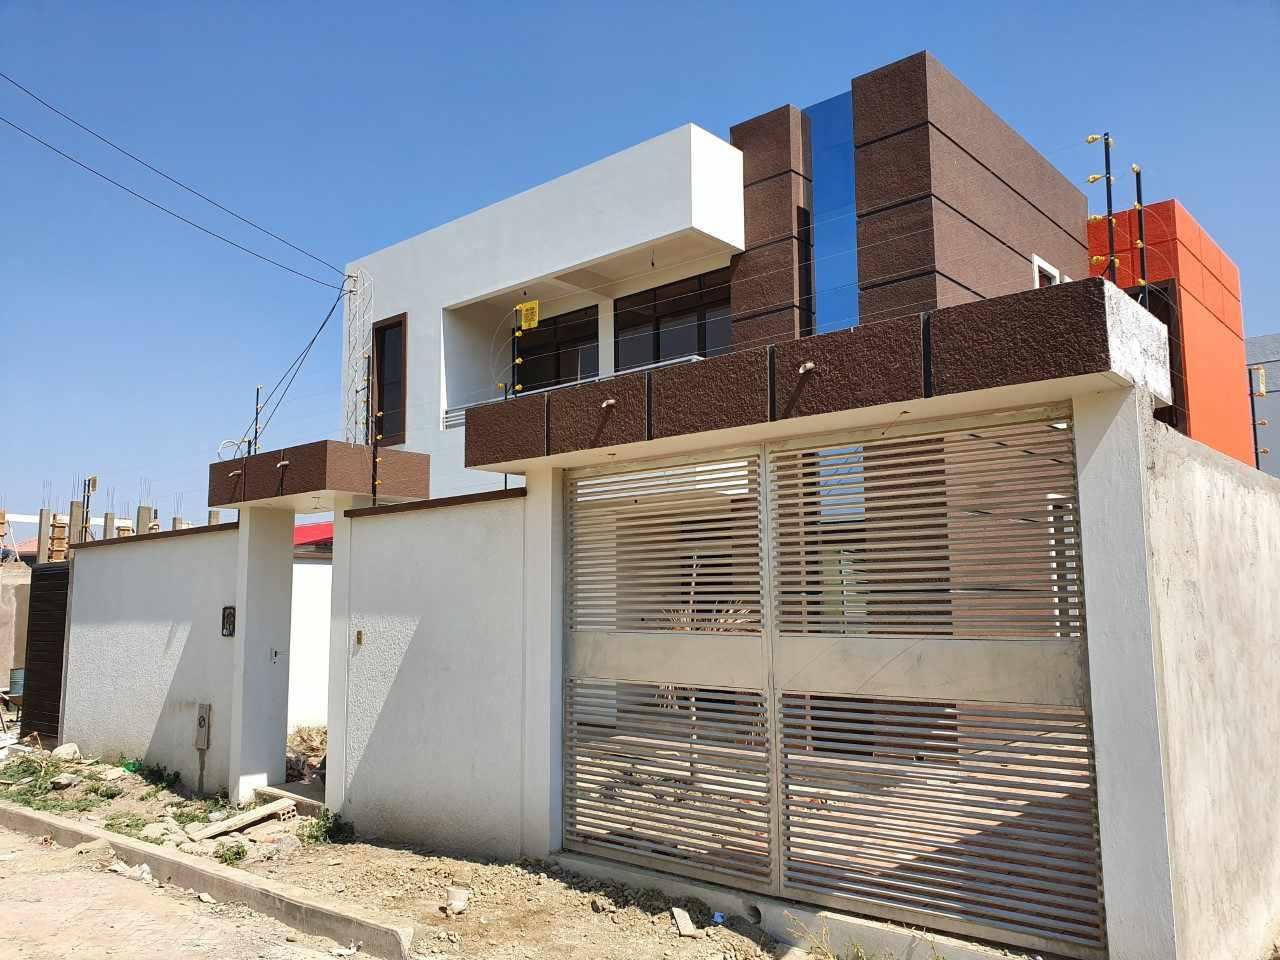 Casa en Venta Calle La Paz, Barrio Kami, Zona Don Bosco  Foto 2